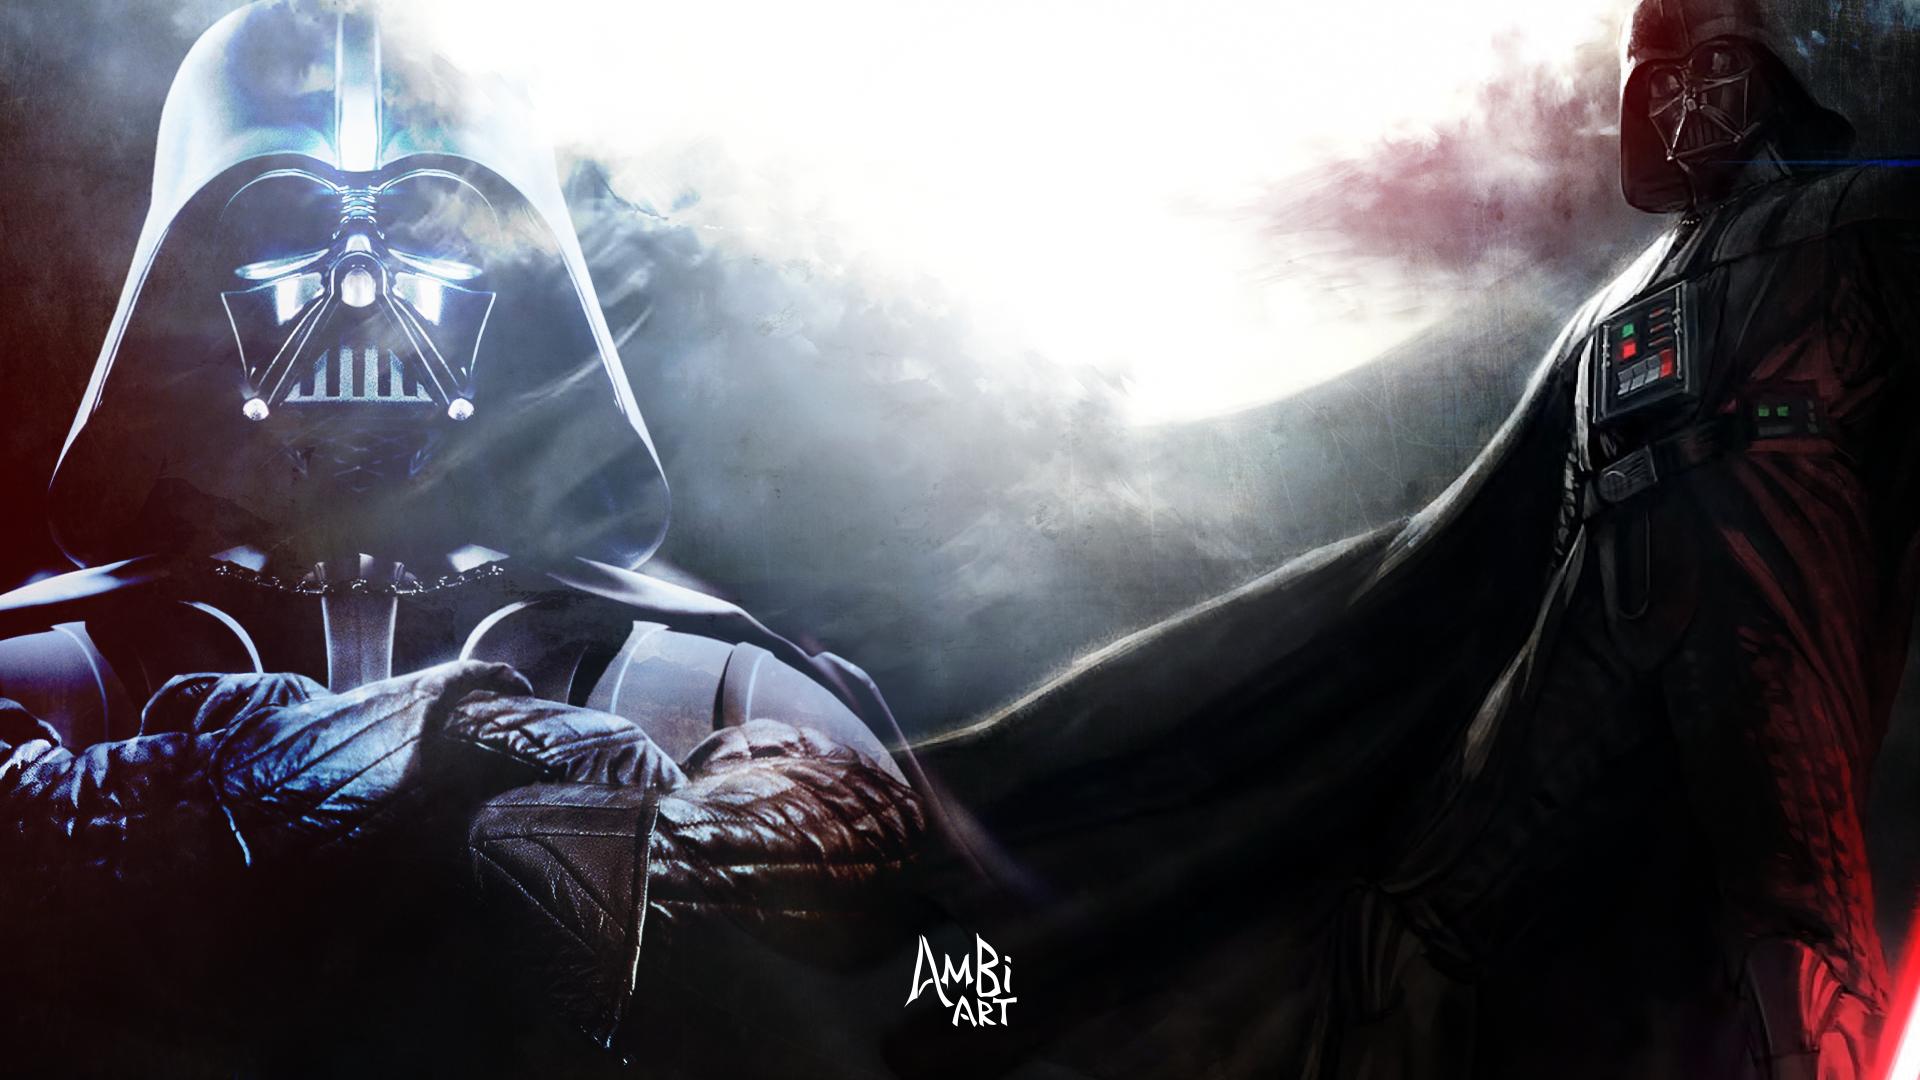 Wallpaper Star Wars Anime Darth Vader Anakin Skywalker Darkness Screenshot Computer Wallpaper 1920x1080 Droma 183288 Hd Wallpapers Wallhere